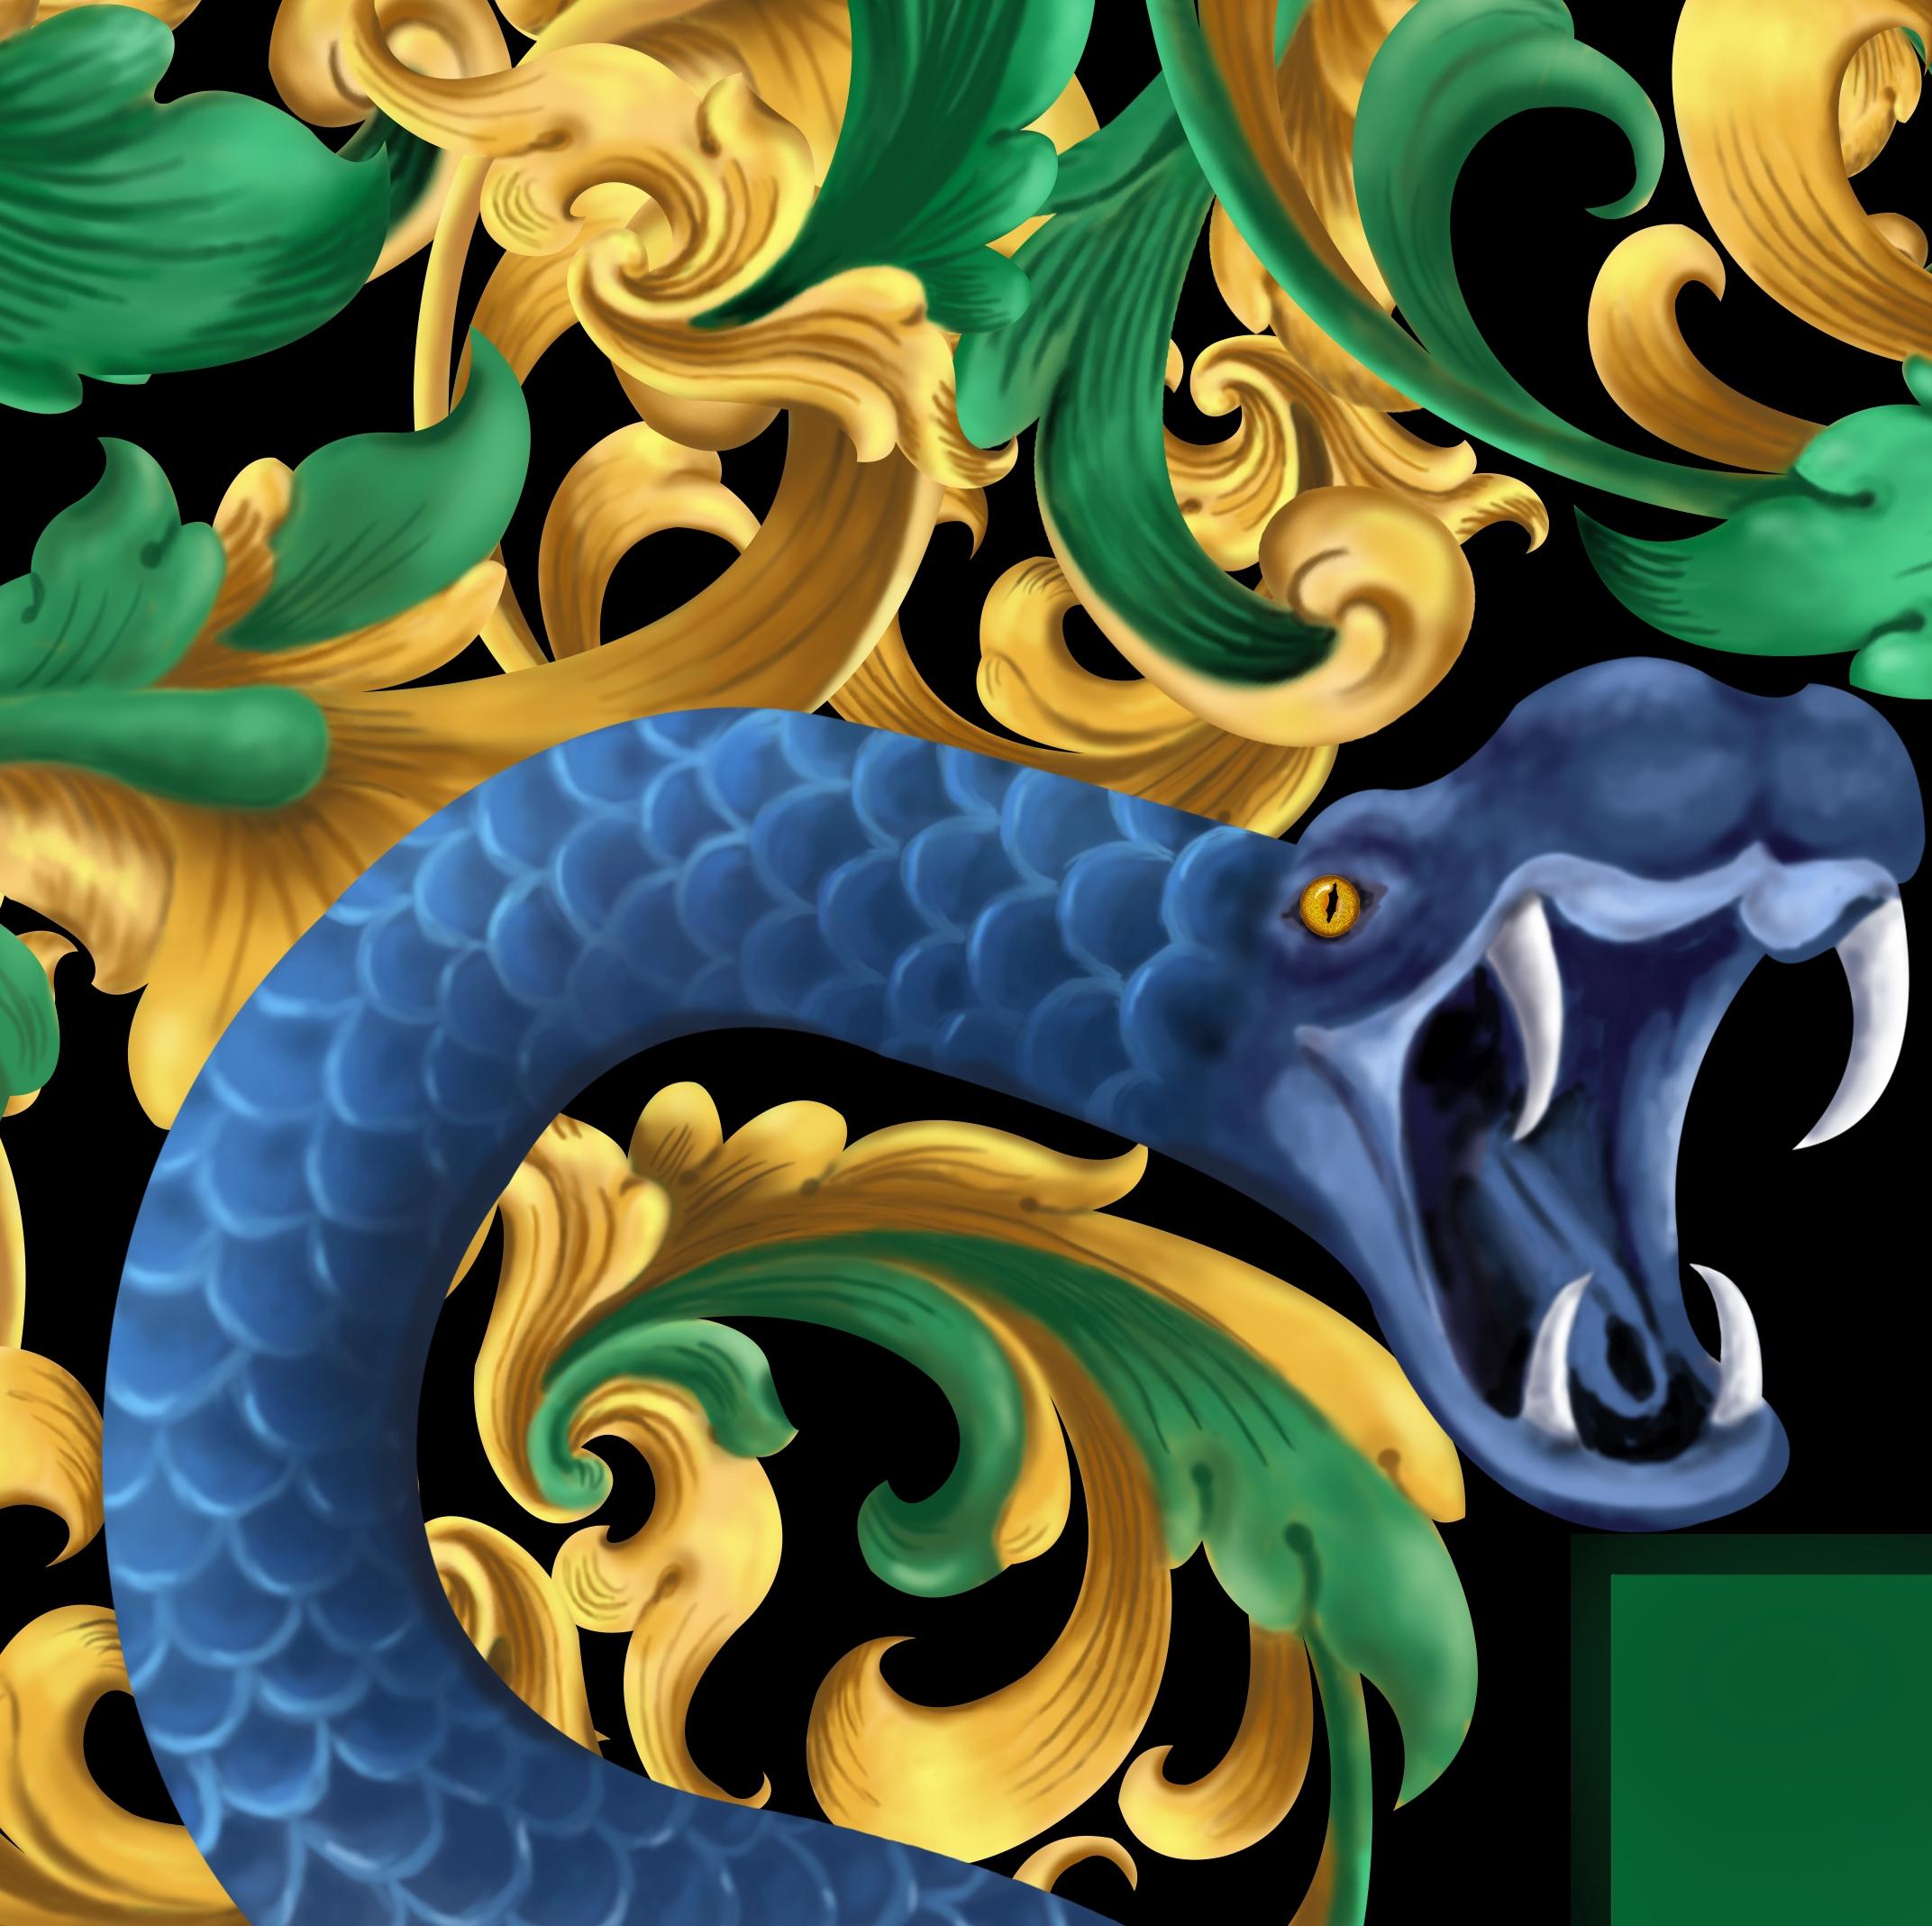 Kabuto coat of arms detail 2